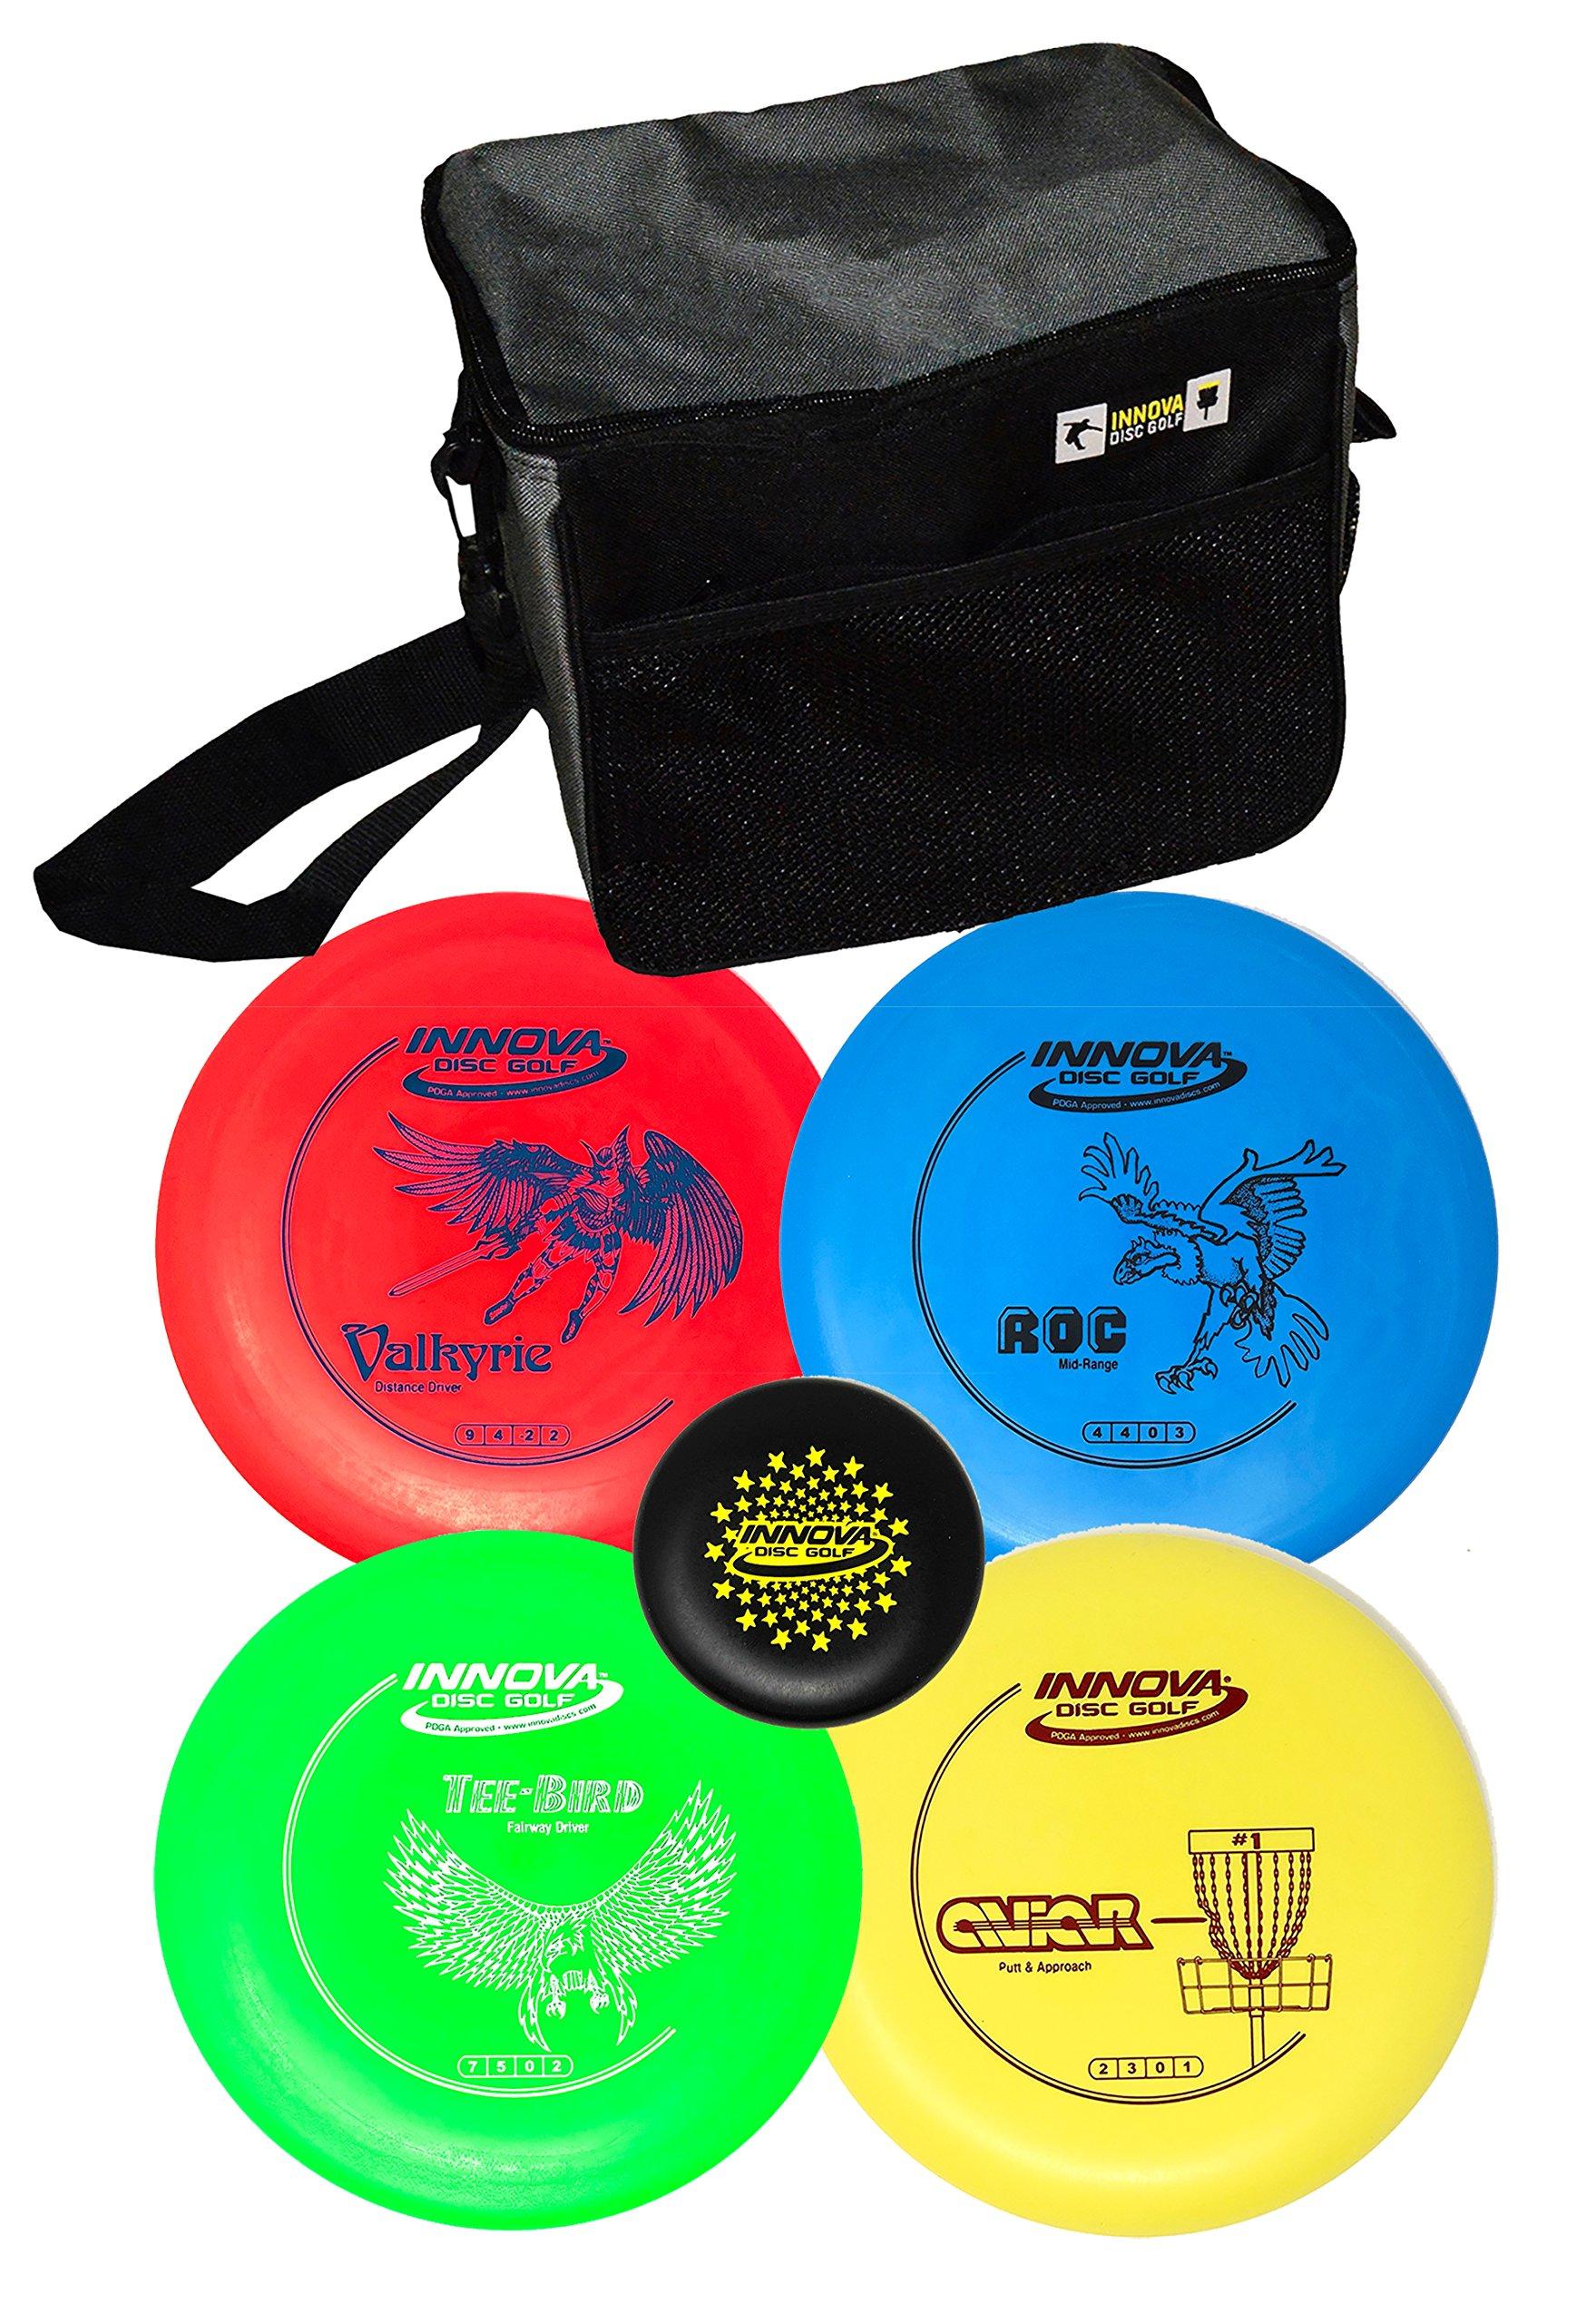 Innova Disc Golf Set with 4 Discs Starter Disc Golf Bag – DX Distance Driver, Fairway Driver, Mid-Range, Putter and Mini Marker Disc